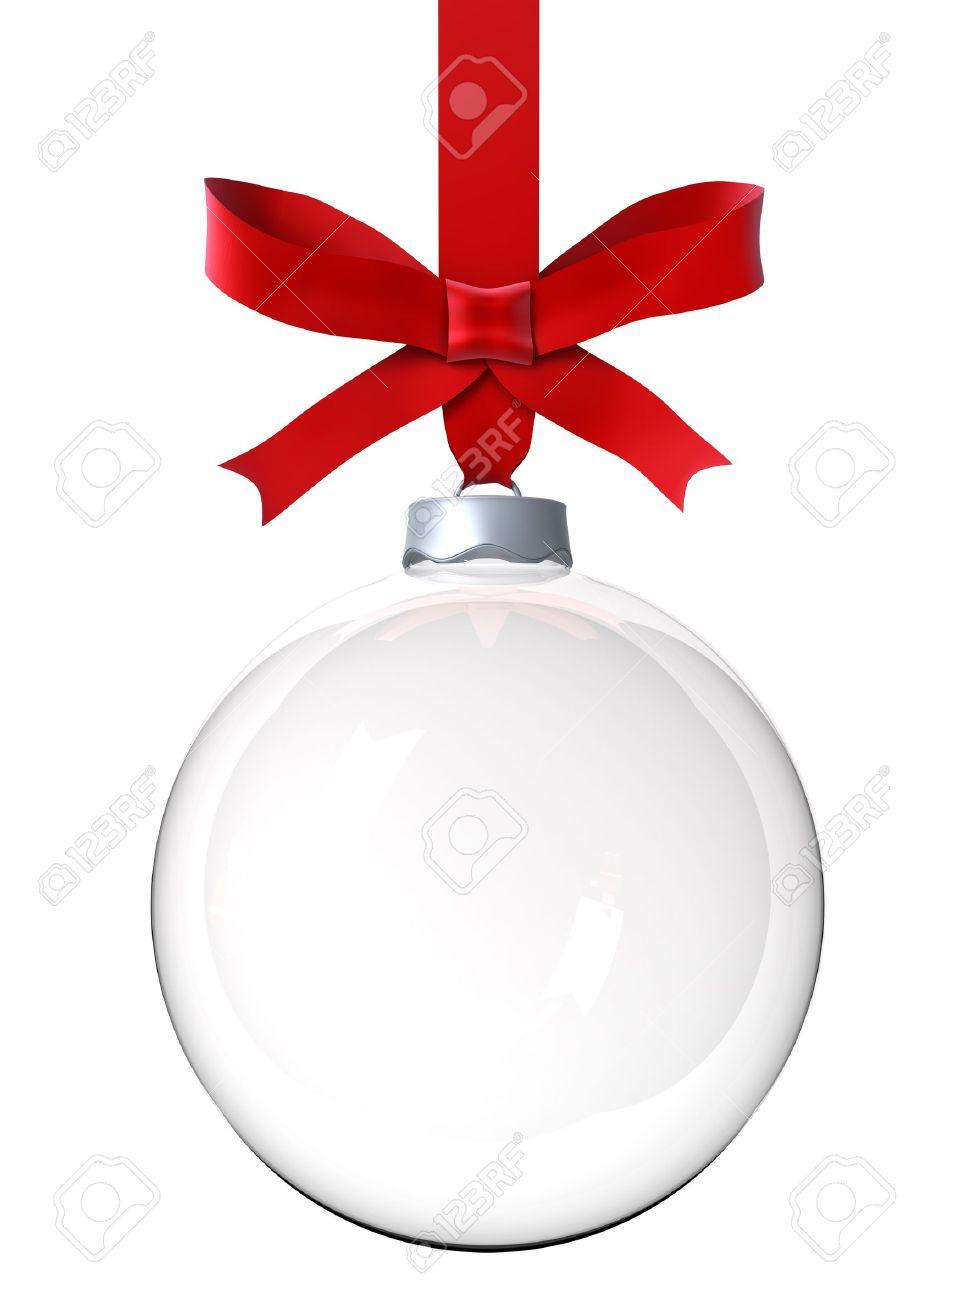 Empty Christmas ornament Stock Photo - 8379185